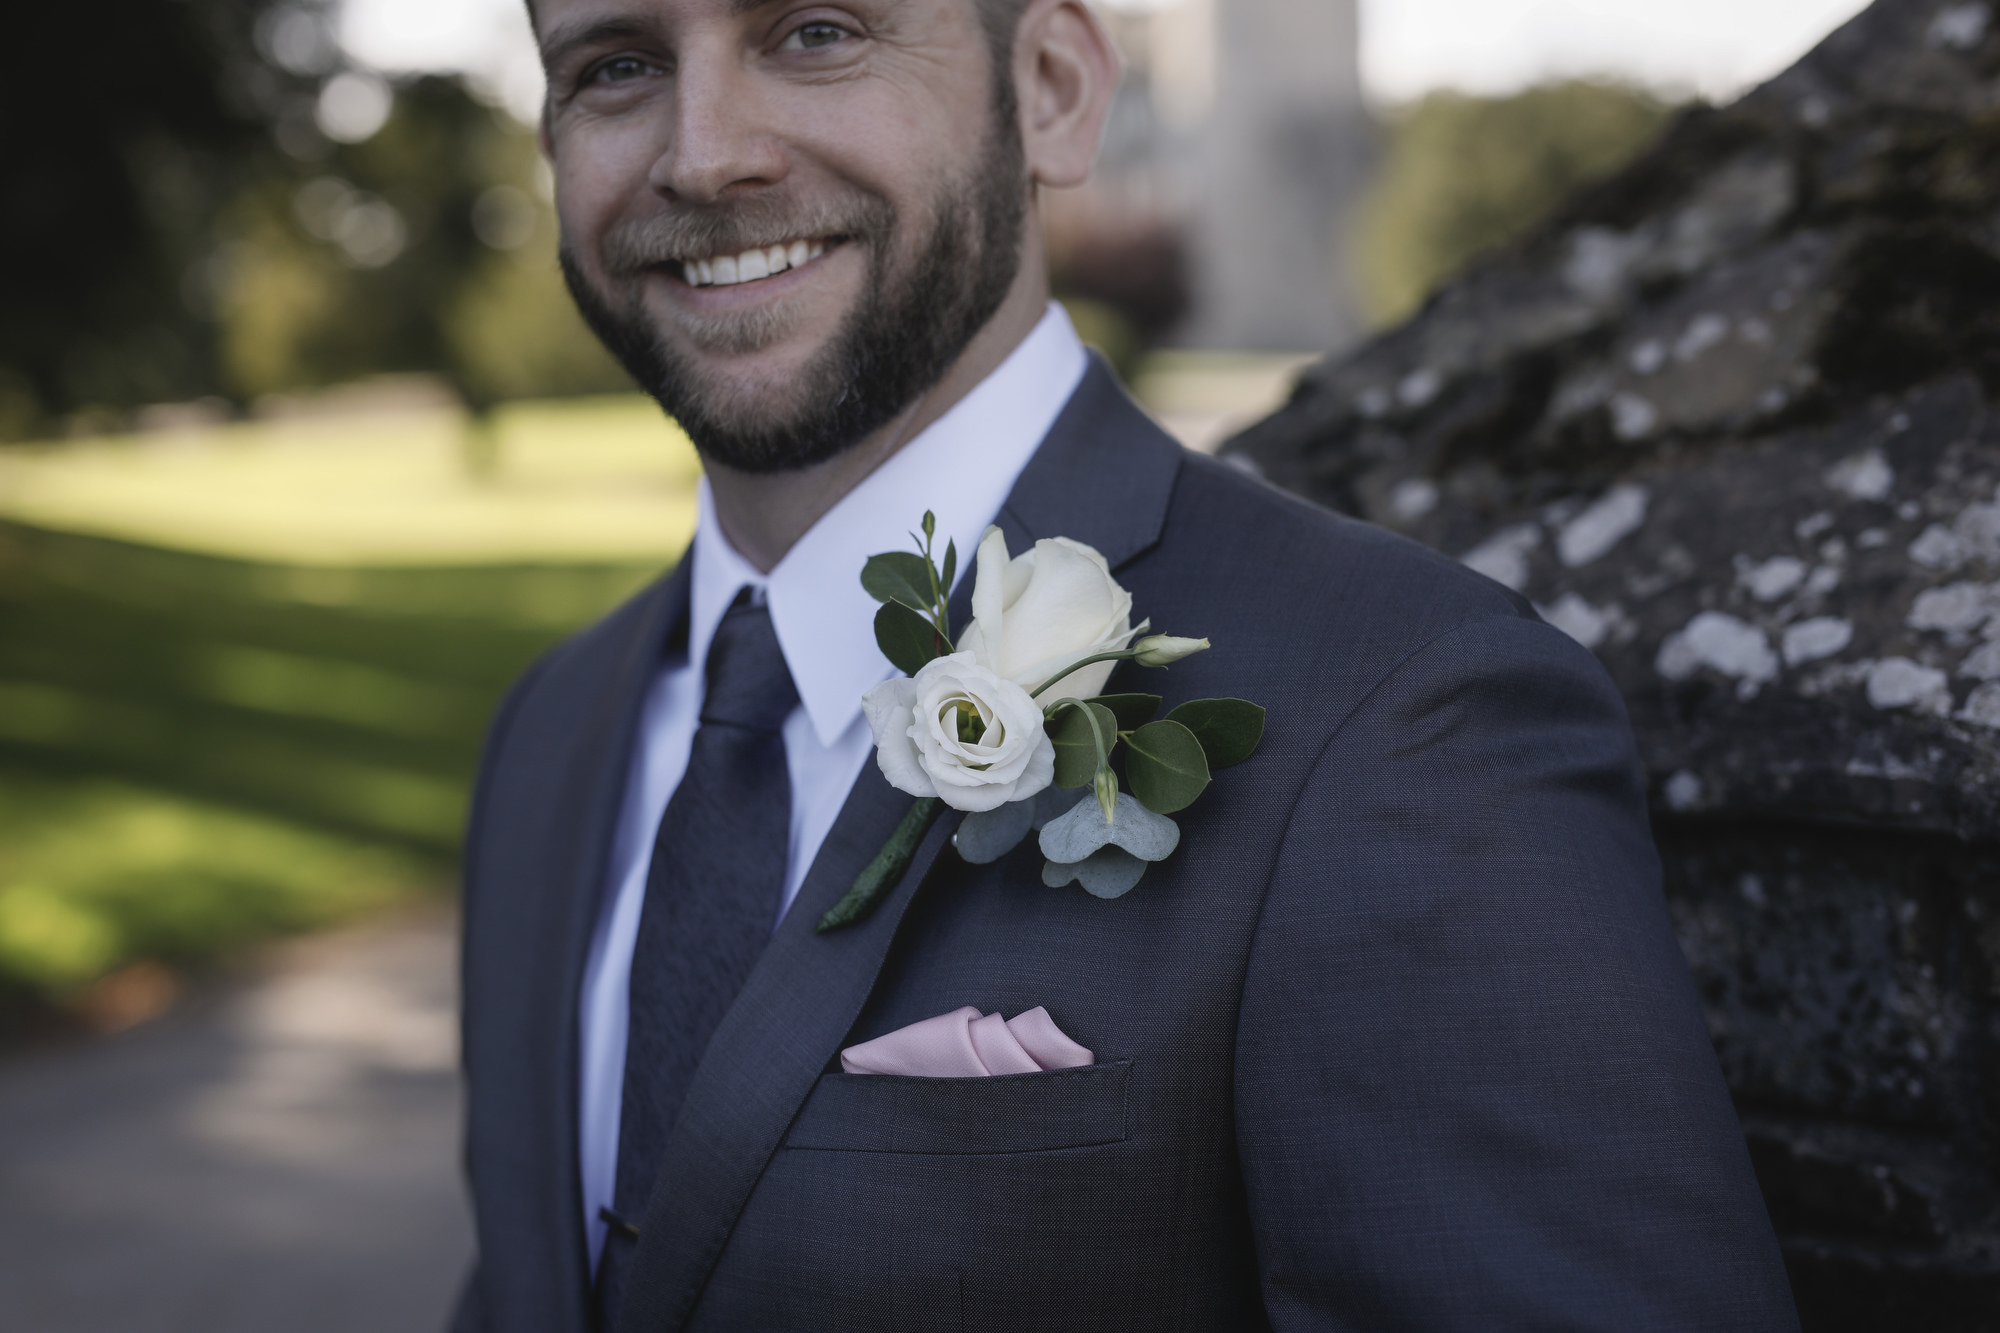 kilkea_castle_wedding_photographer_goldenmoments_003.jpg